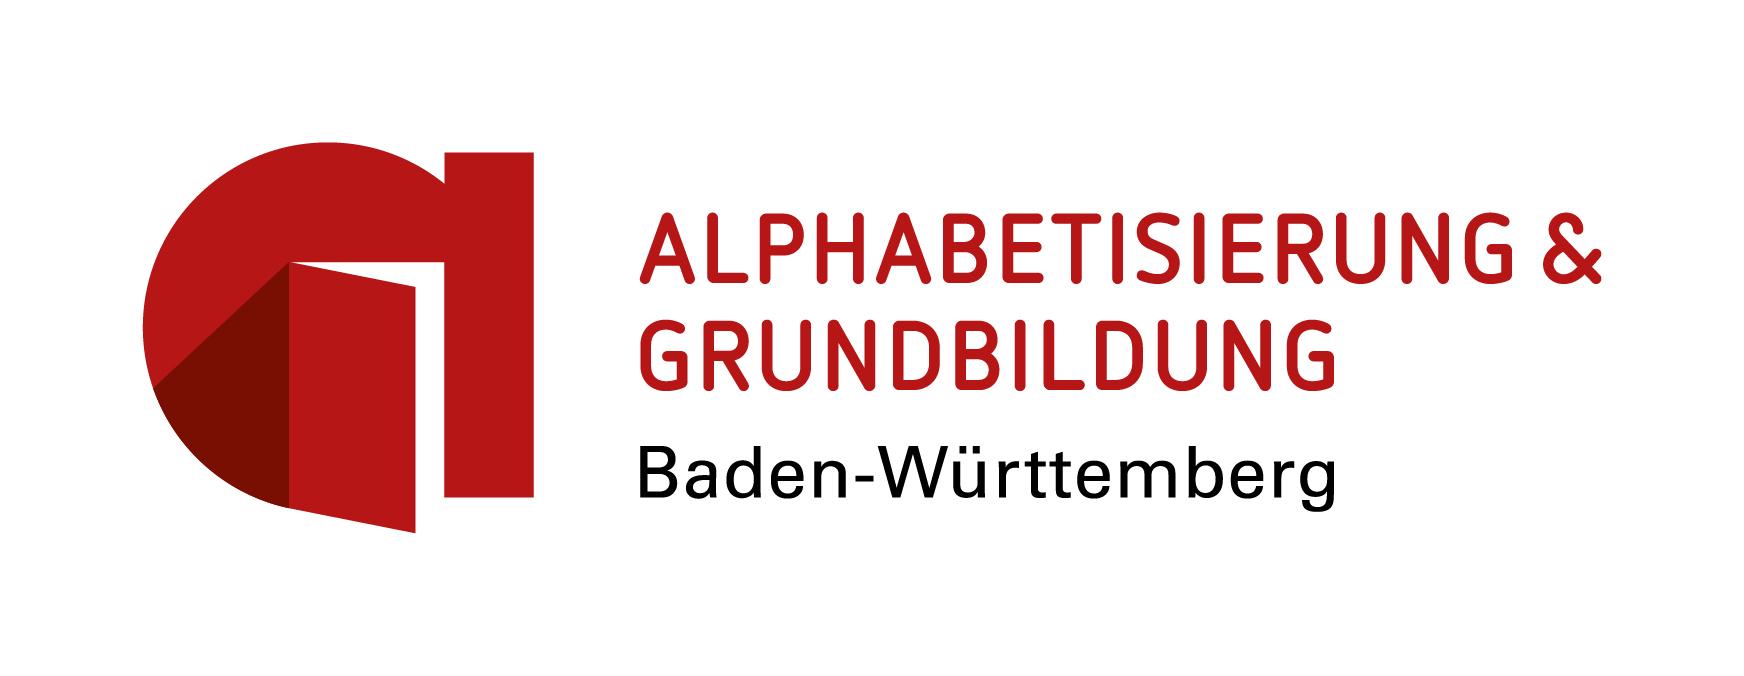 /img/upload/GrundBildungsZentrum/Alphabetisierung_Grundbildung_BaWü_Logo.jpg